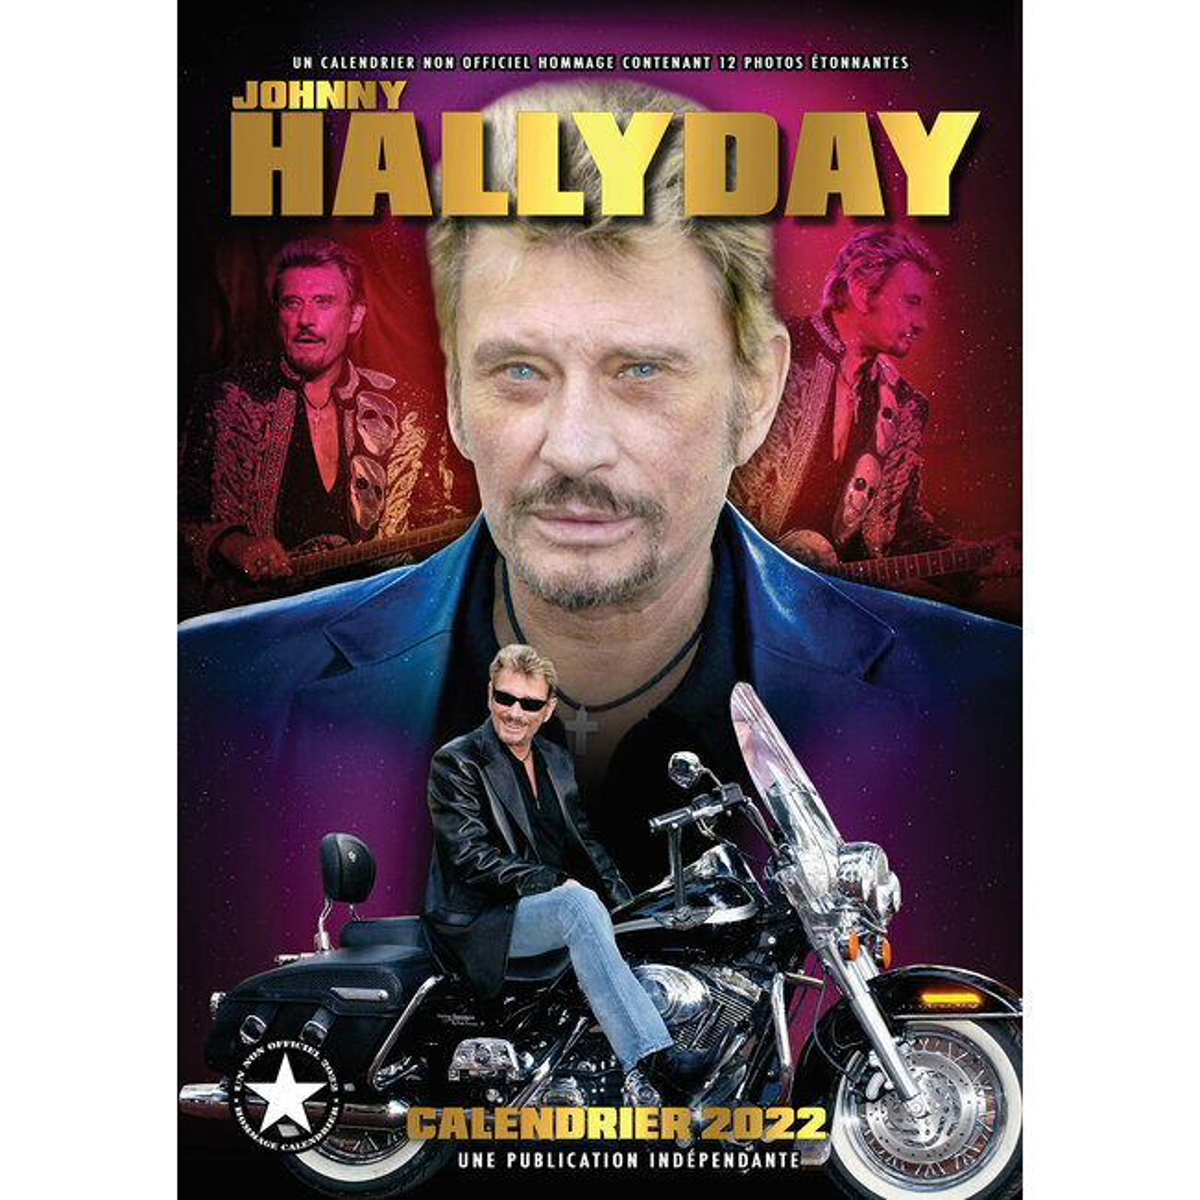 Calendrier Johnny Hallyday 2022 La Poste Calendrier 2022 Johnny Hallyday format A3